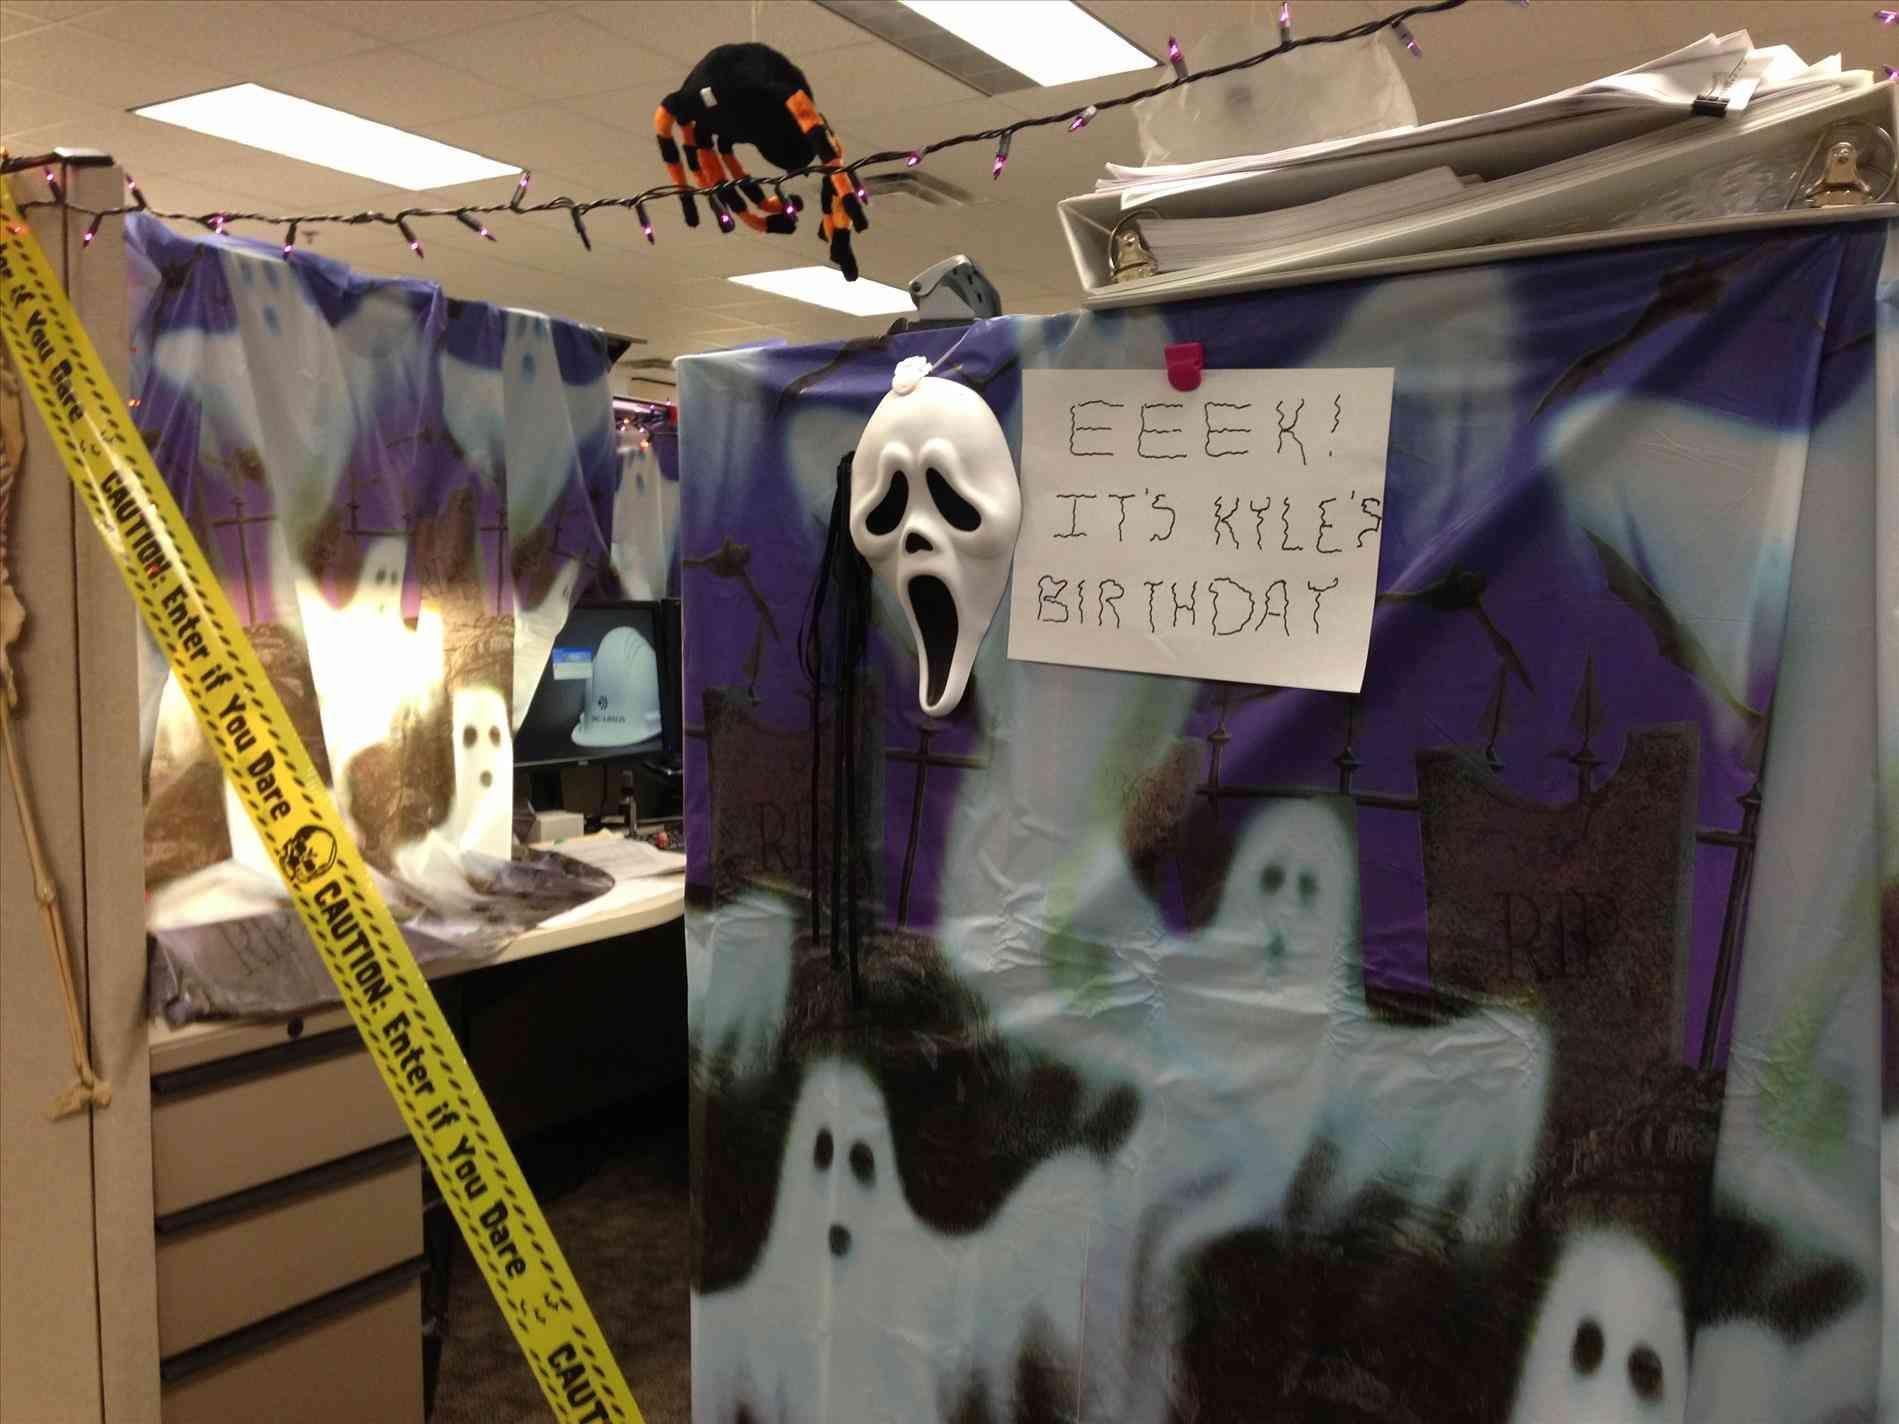 halloween office decoration ideas. New Posting Halloween Office Decorations On This Bdarop Decors Decoration Ideas